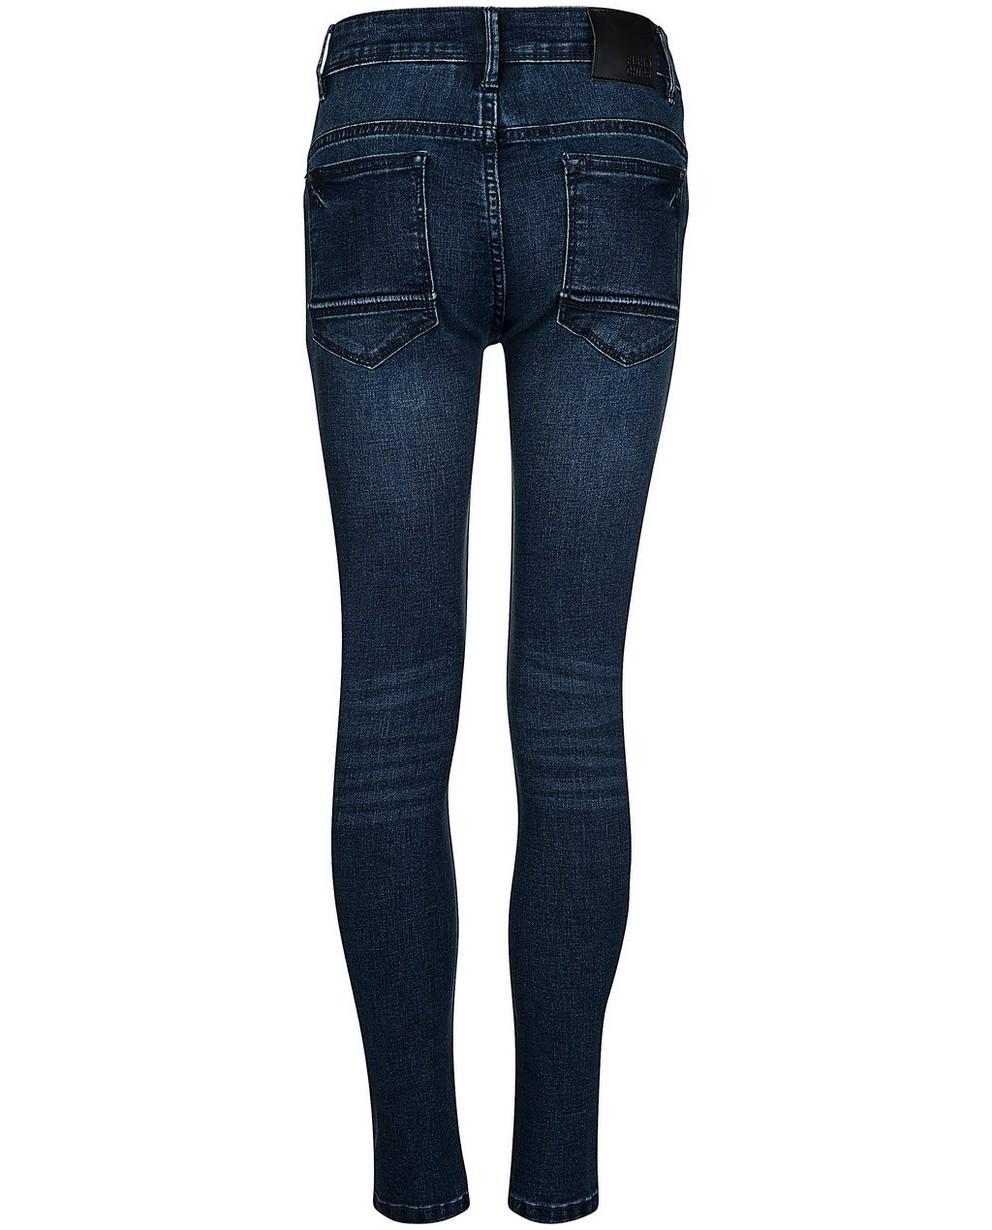 Jeans - navy -